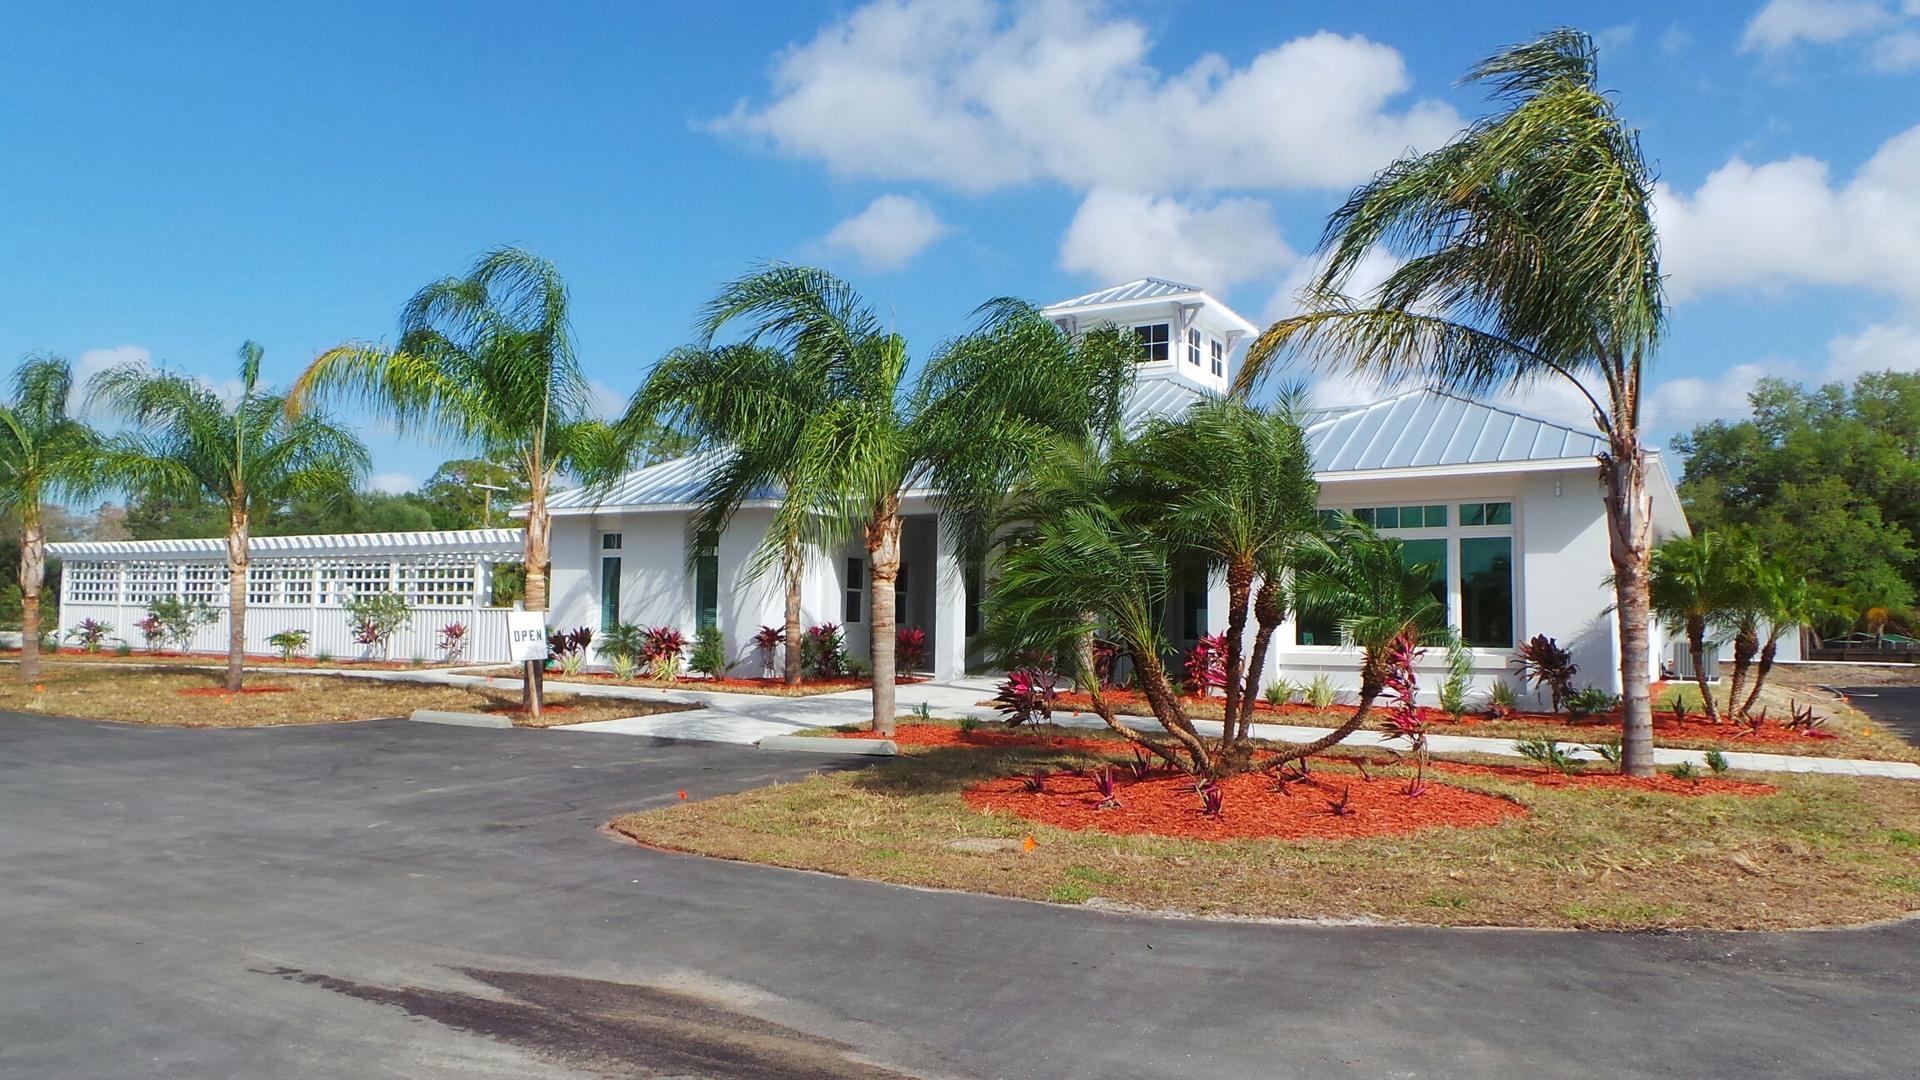 Oak Grove RV Resort - South Florida's Newest Luxury RV